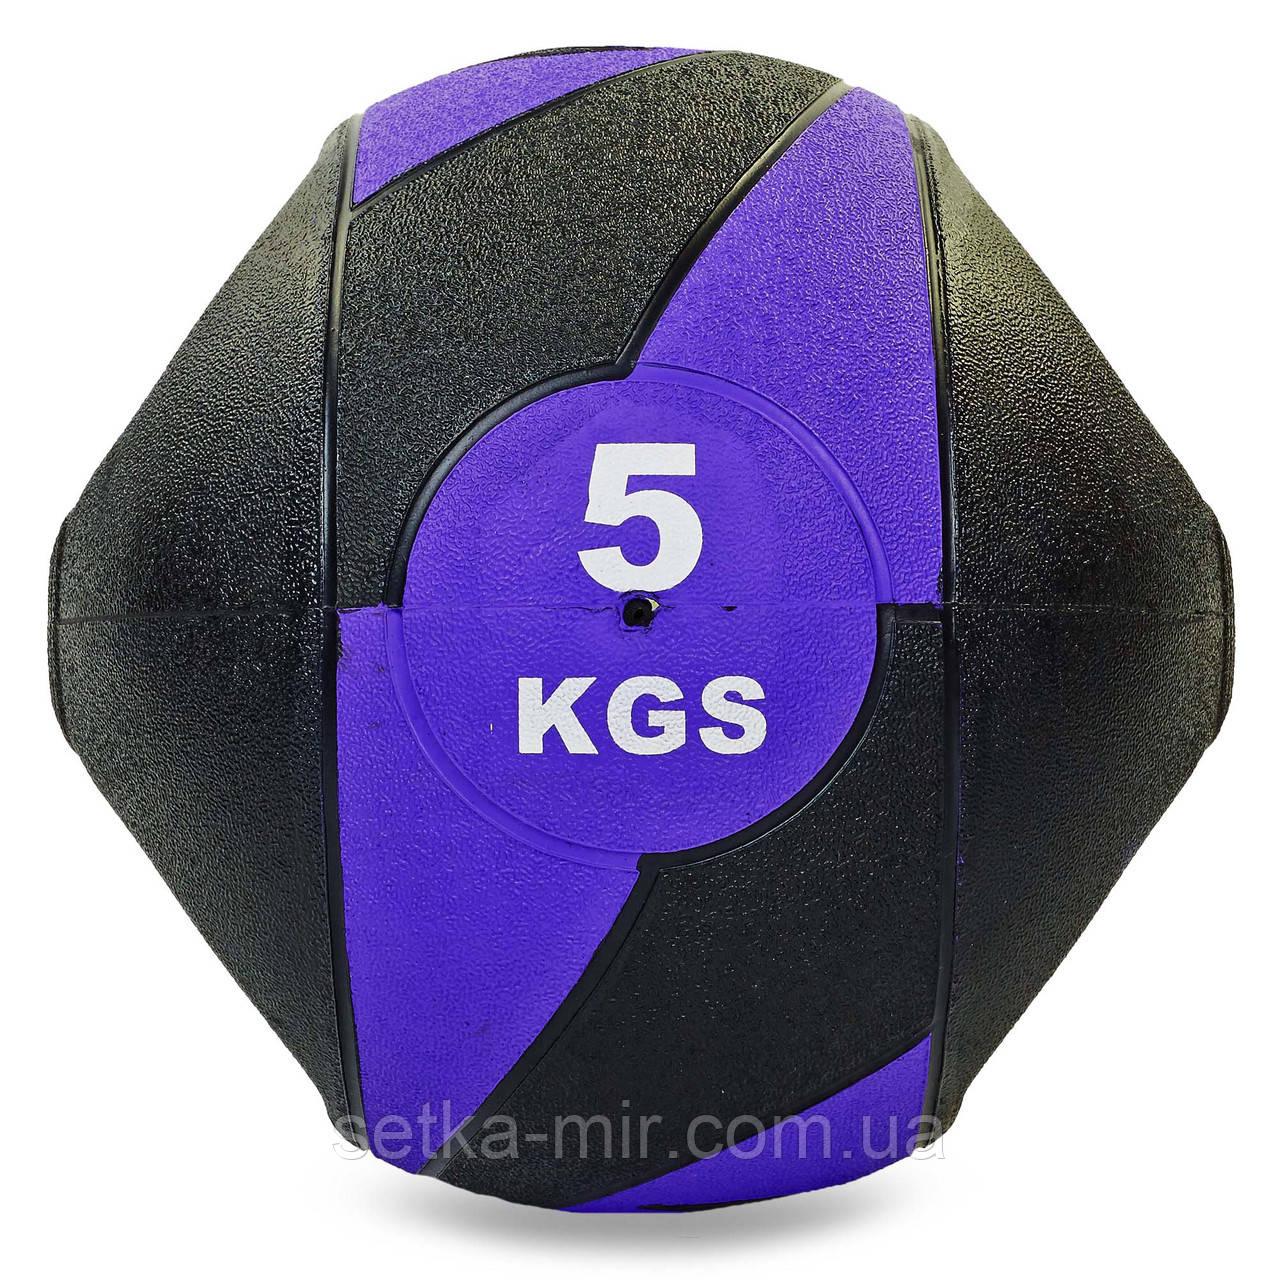 М'яч медичний медбол з двома ручками Record Medicine Ball FI-5111-5 5кг